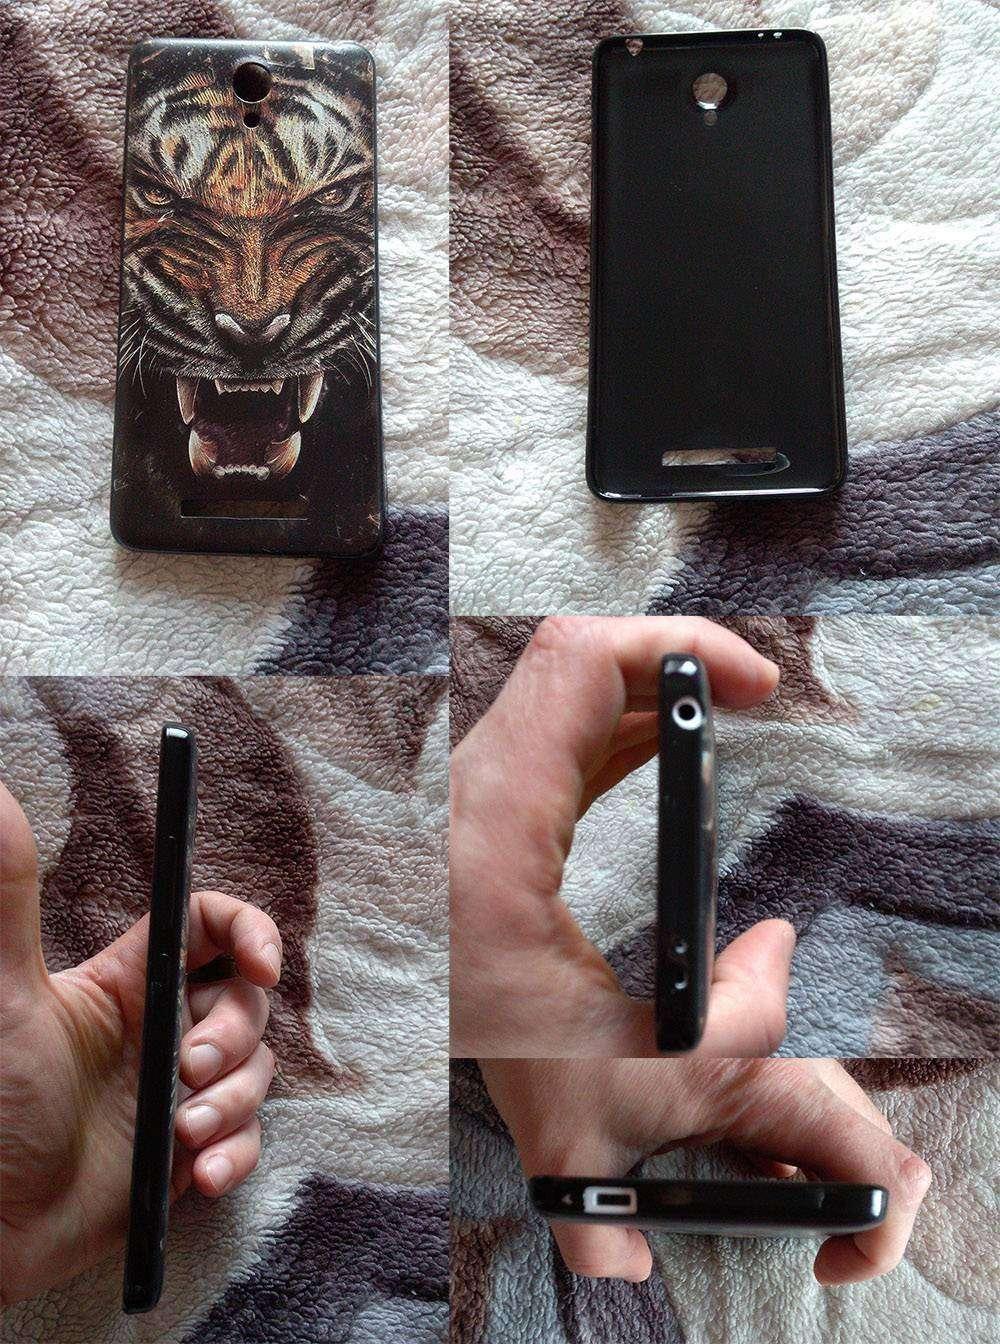 Aliexpress: Два силиконовых бампера для Xiaomi Redmi Note 2